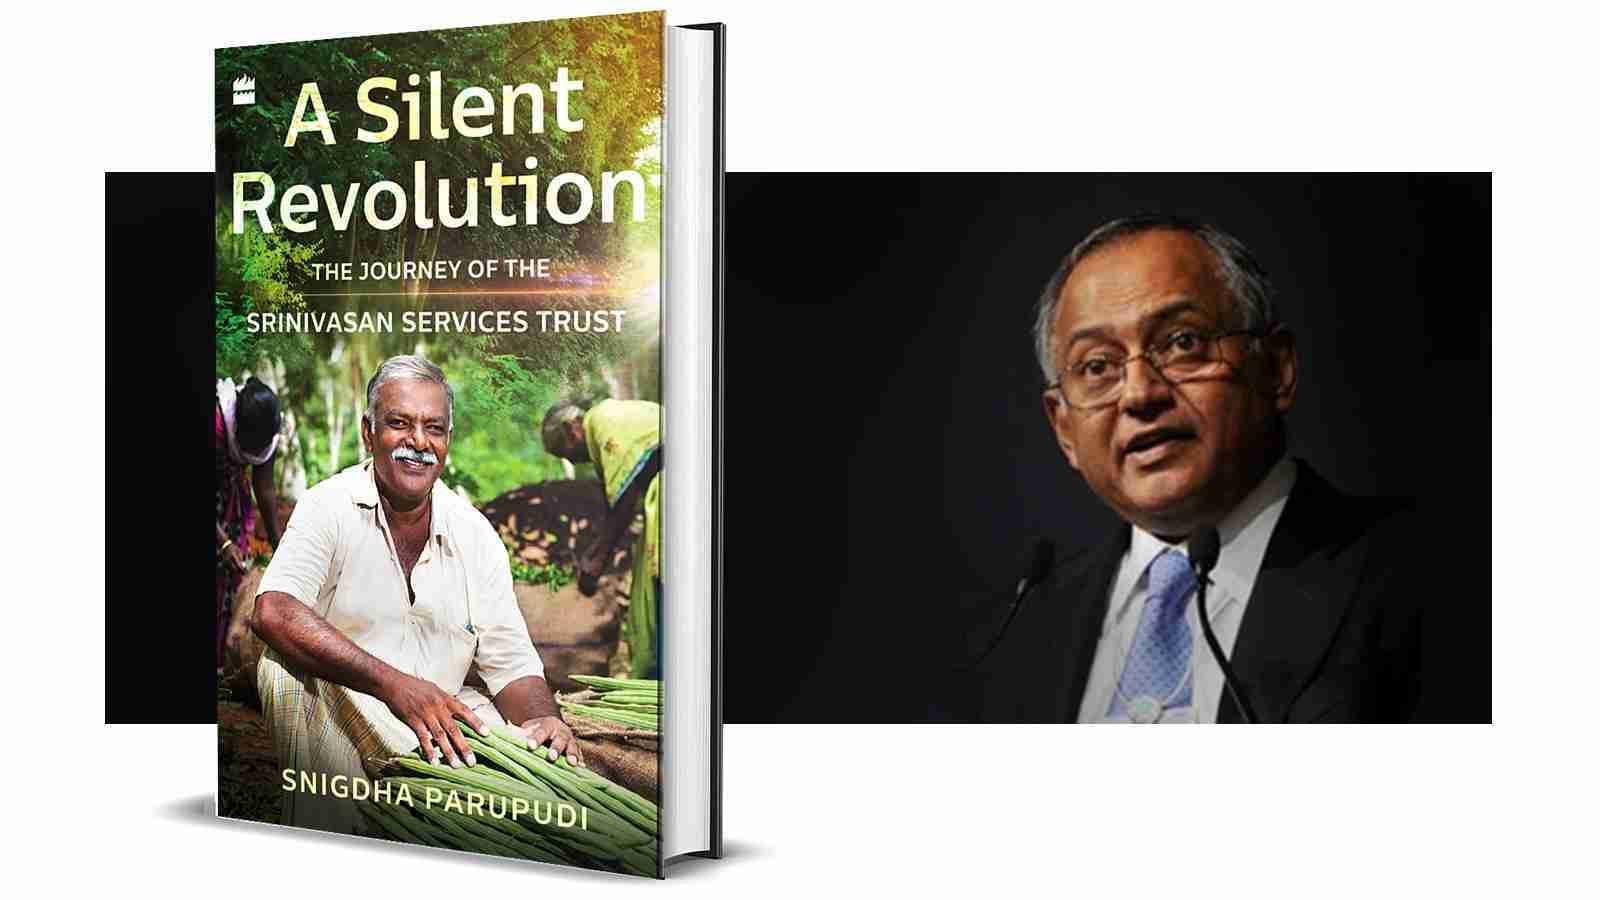 'A Silent Revolution- The Journey of the Srinivasan Services Trust'